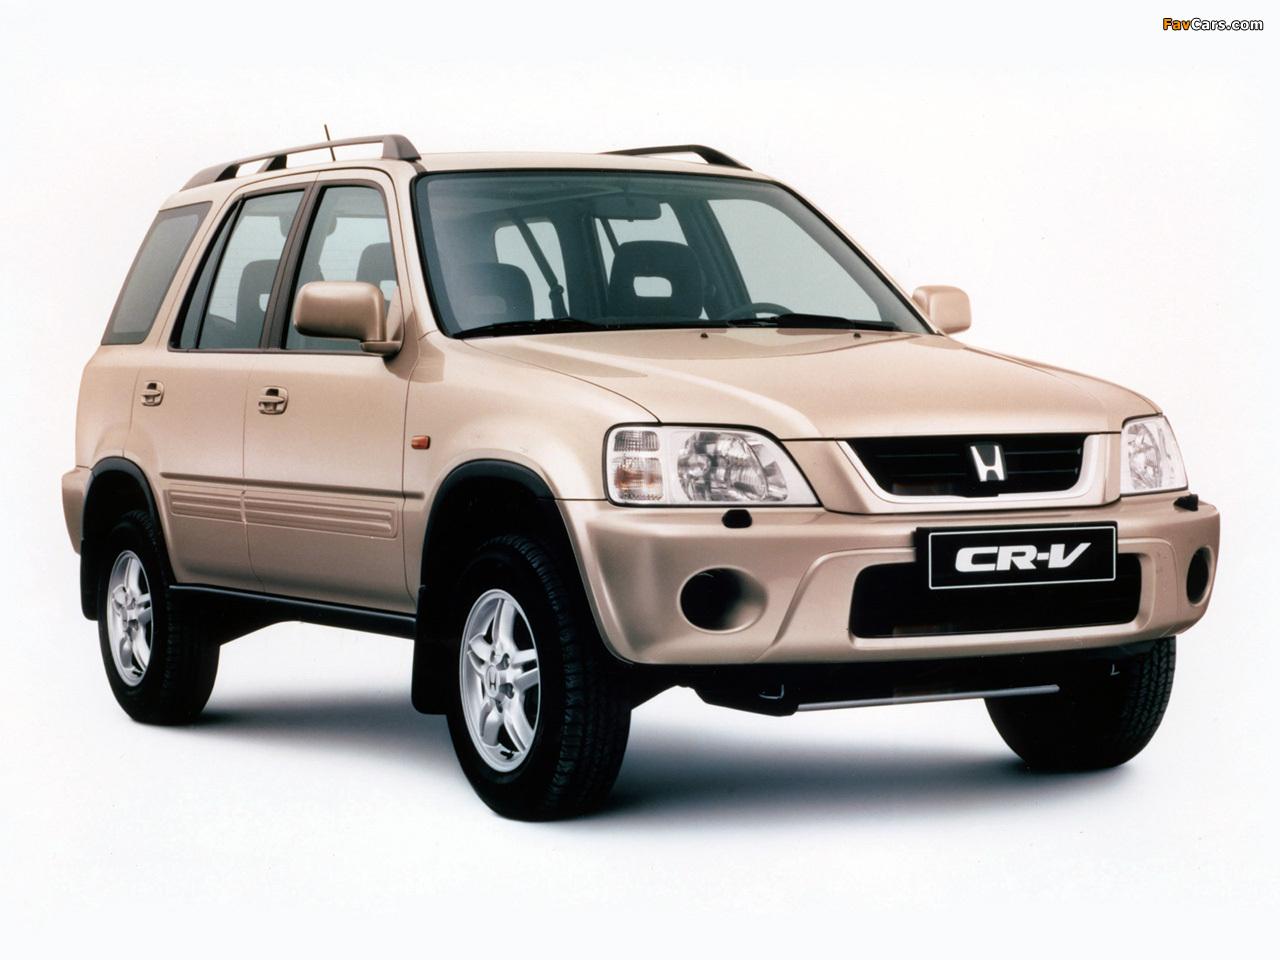 Honda cr v rd1 1999 2001 photos 1280x960 for 1999 honda accord tire size